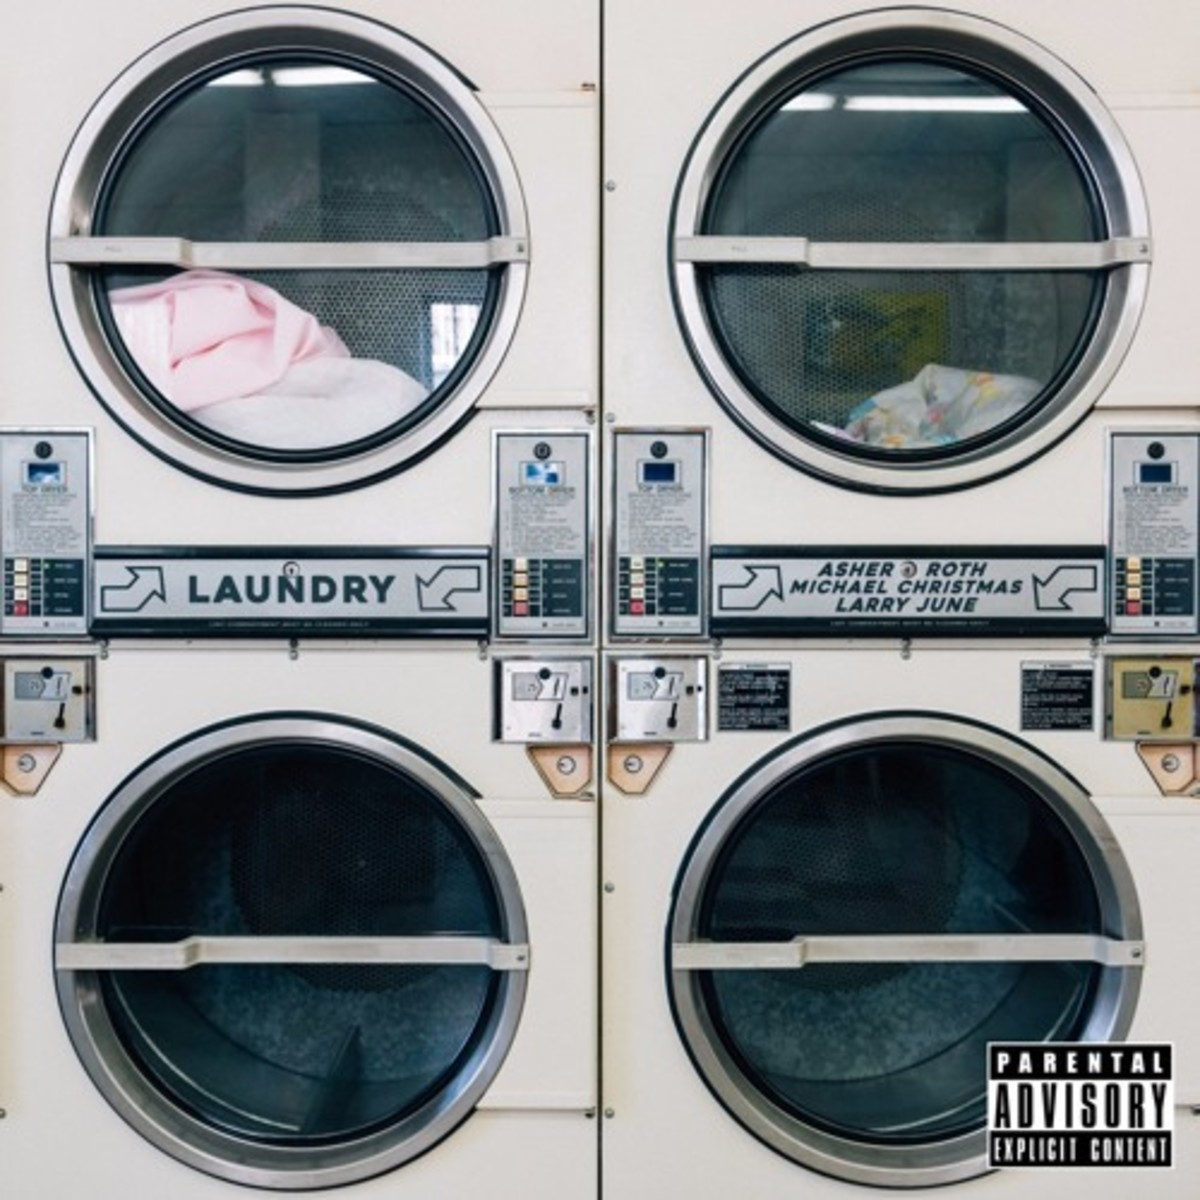 asher-roth-laundry.jpg